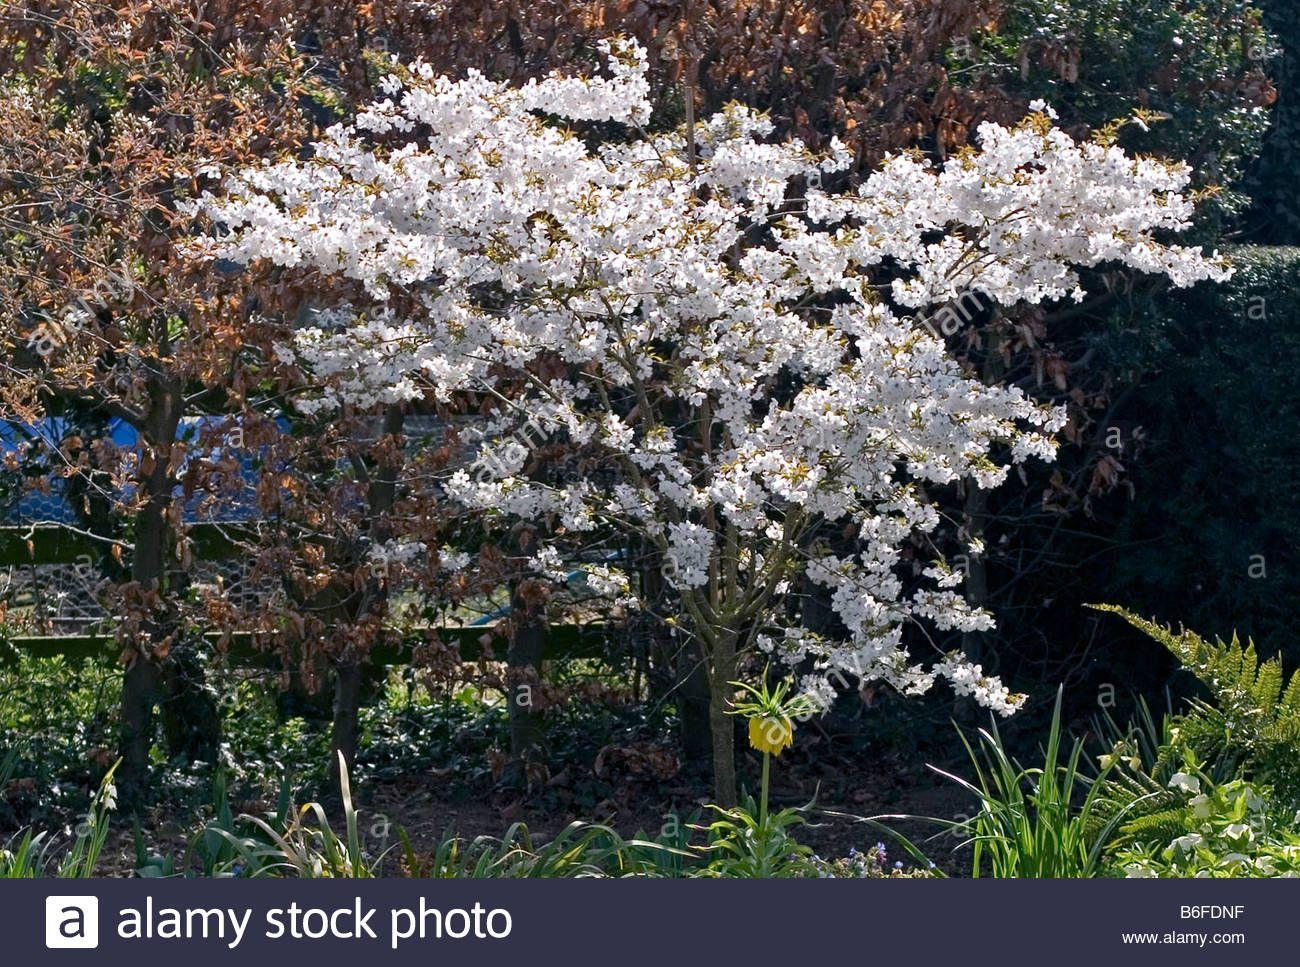 Image Result For Prunus The Bride Tree Garden Trees Prunus Bride